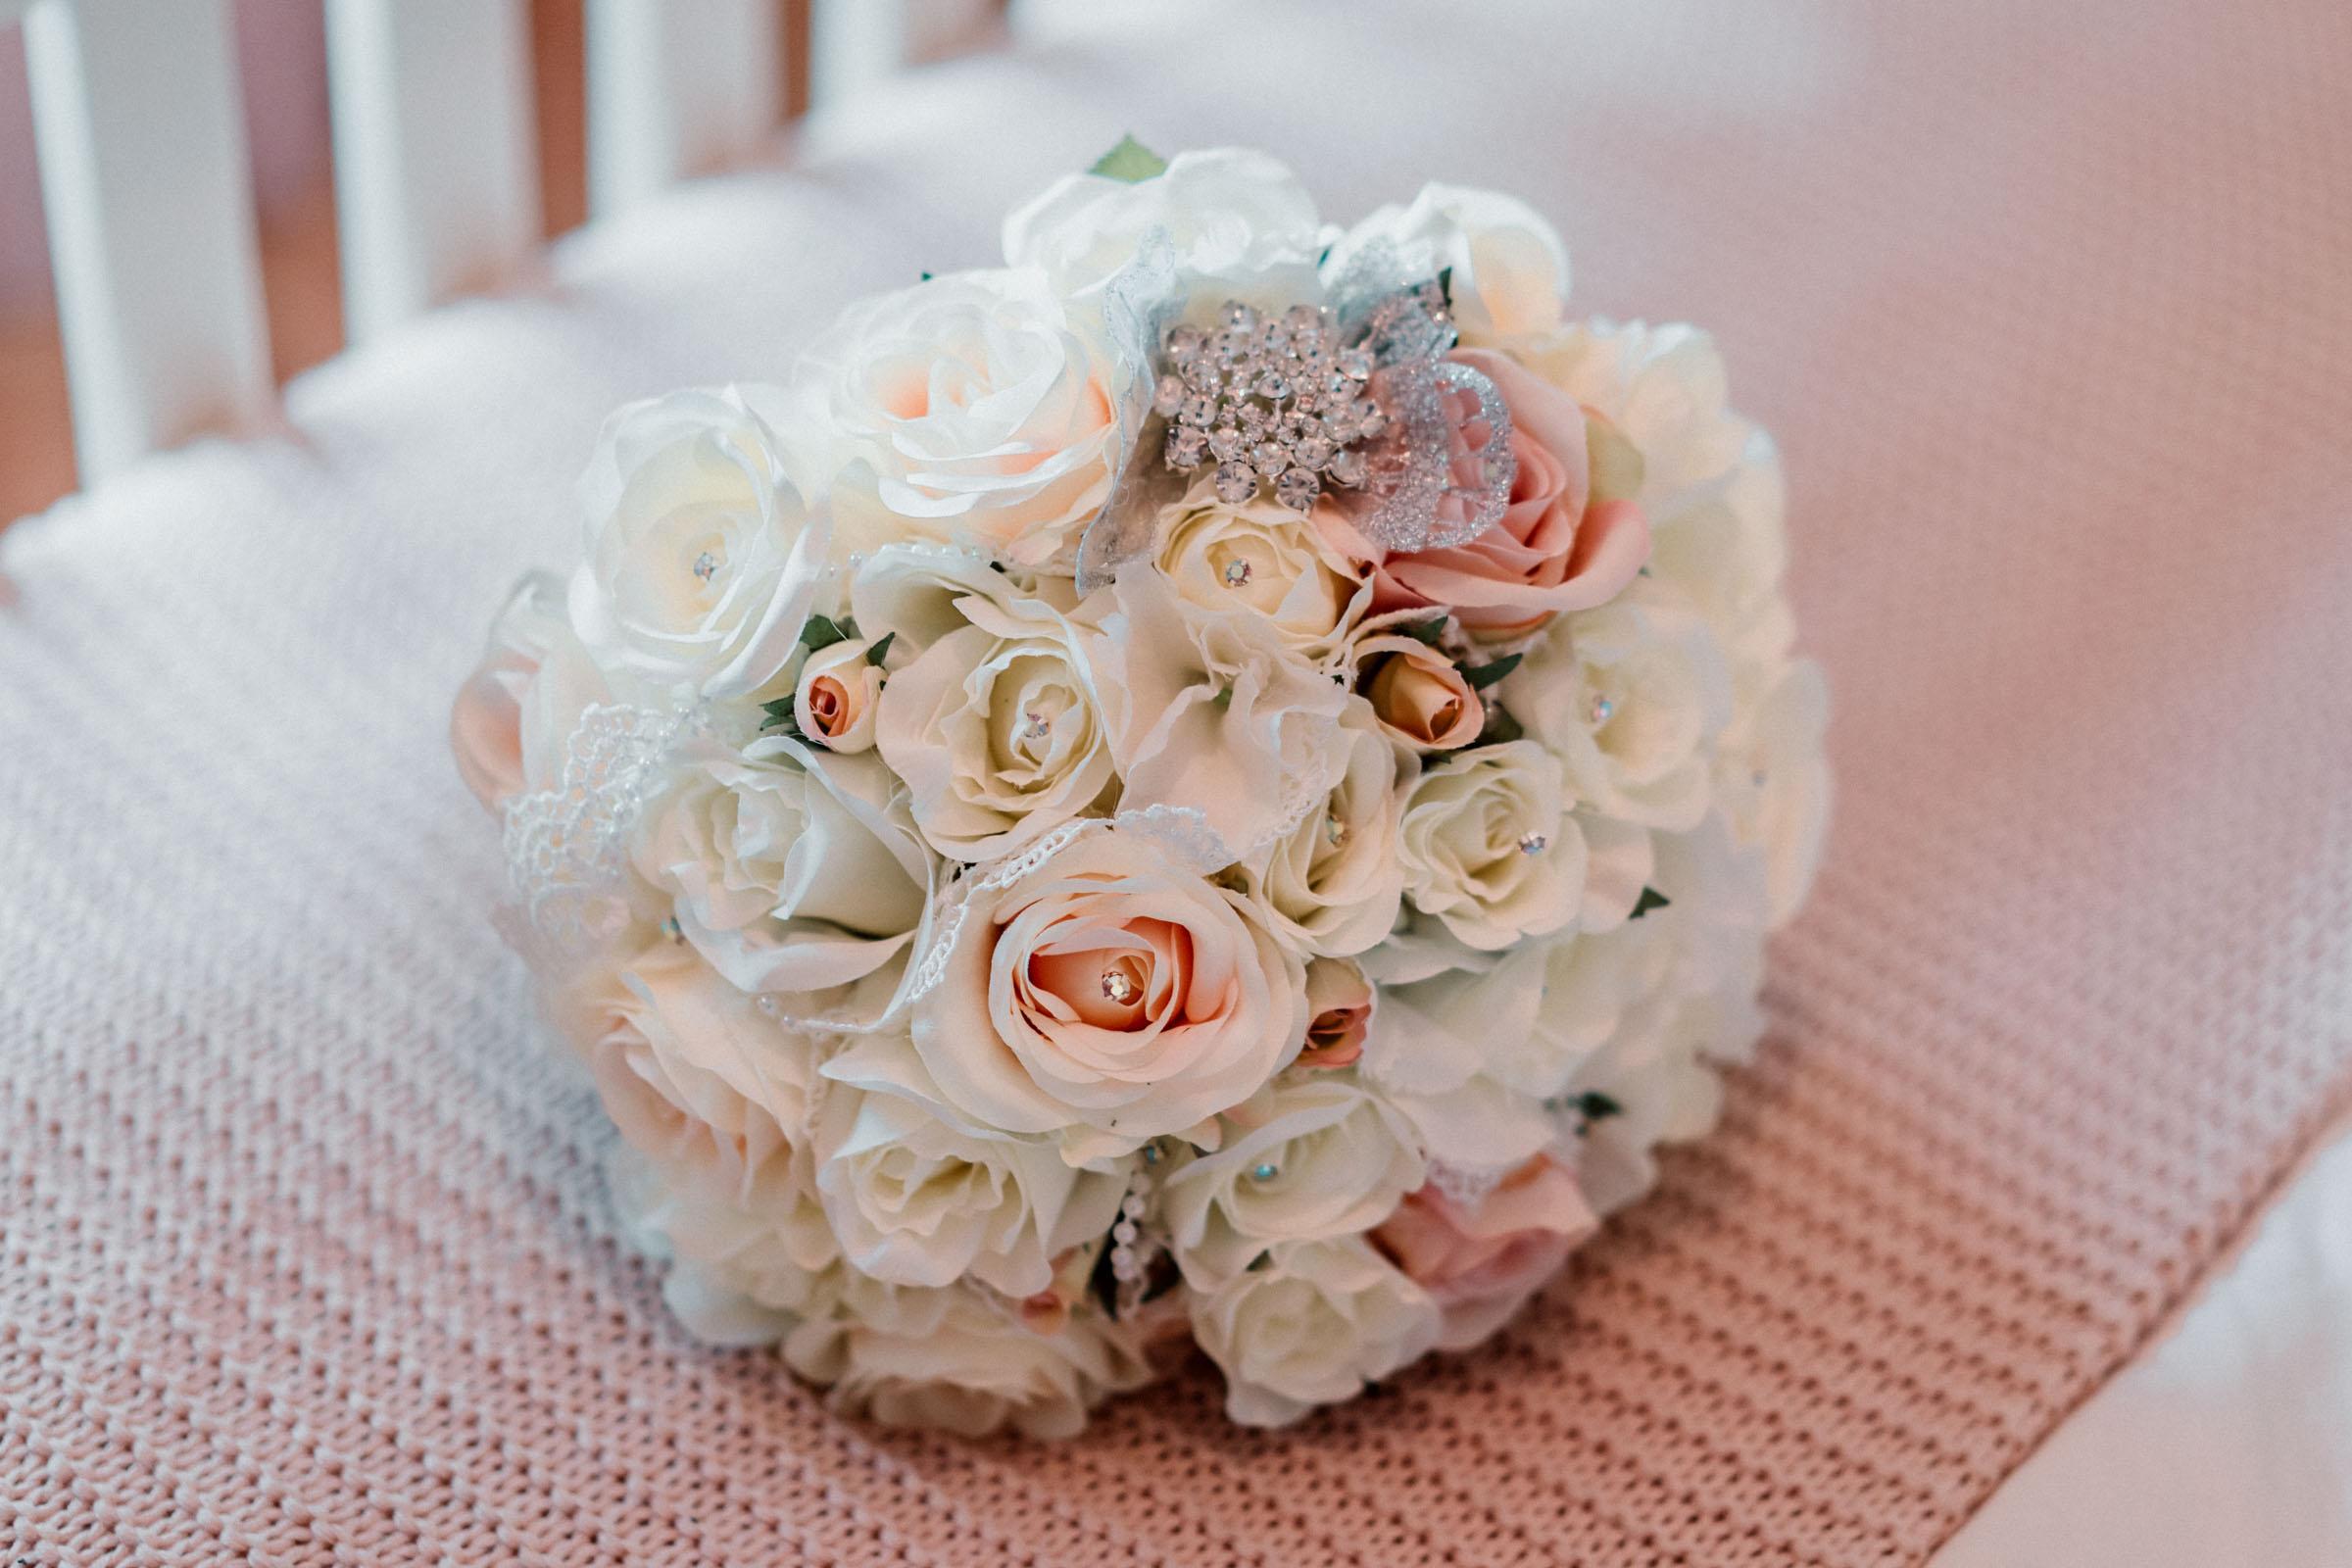 Oran-Mor-Wedding-Photographer-DearlyPhotography (2 of 55).jpg